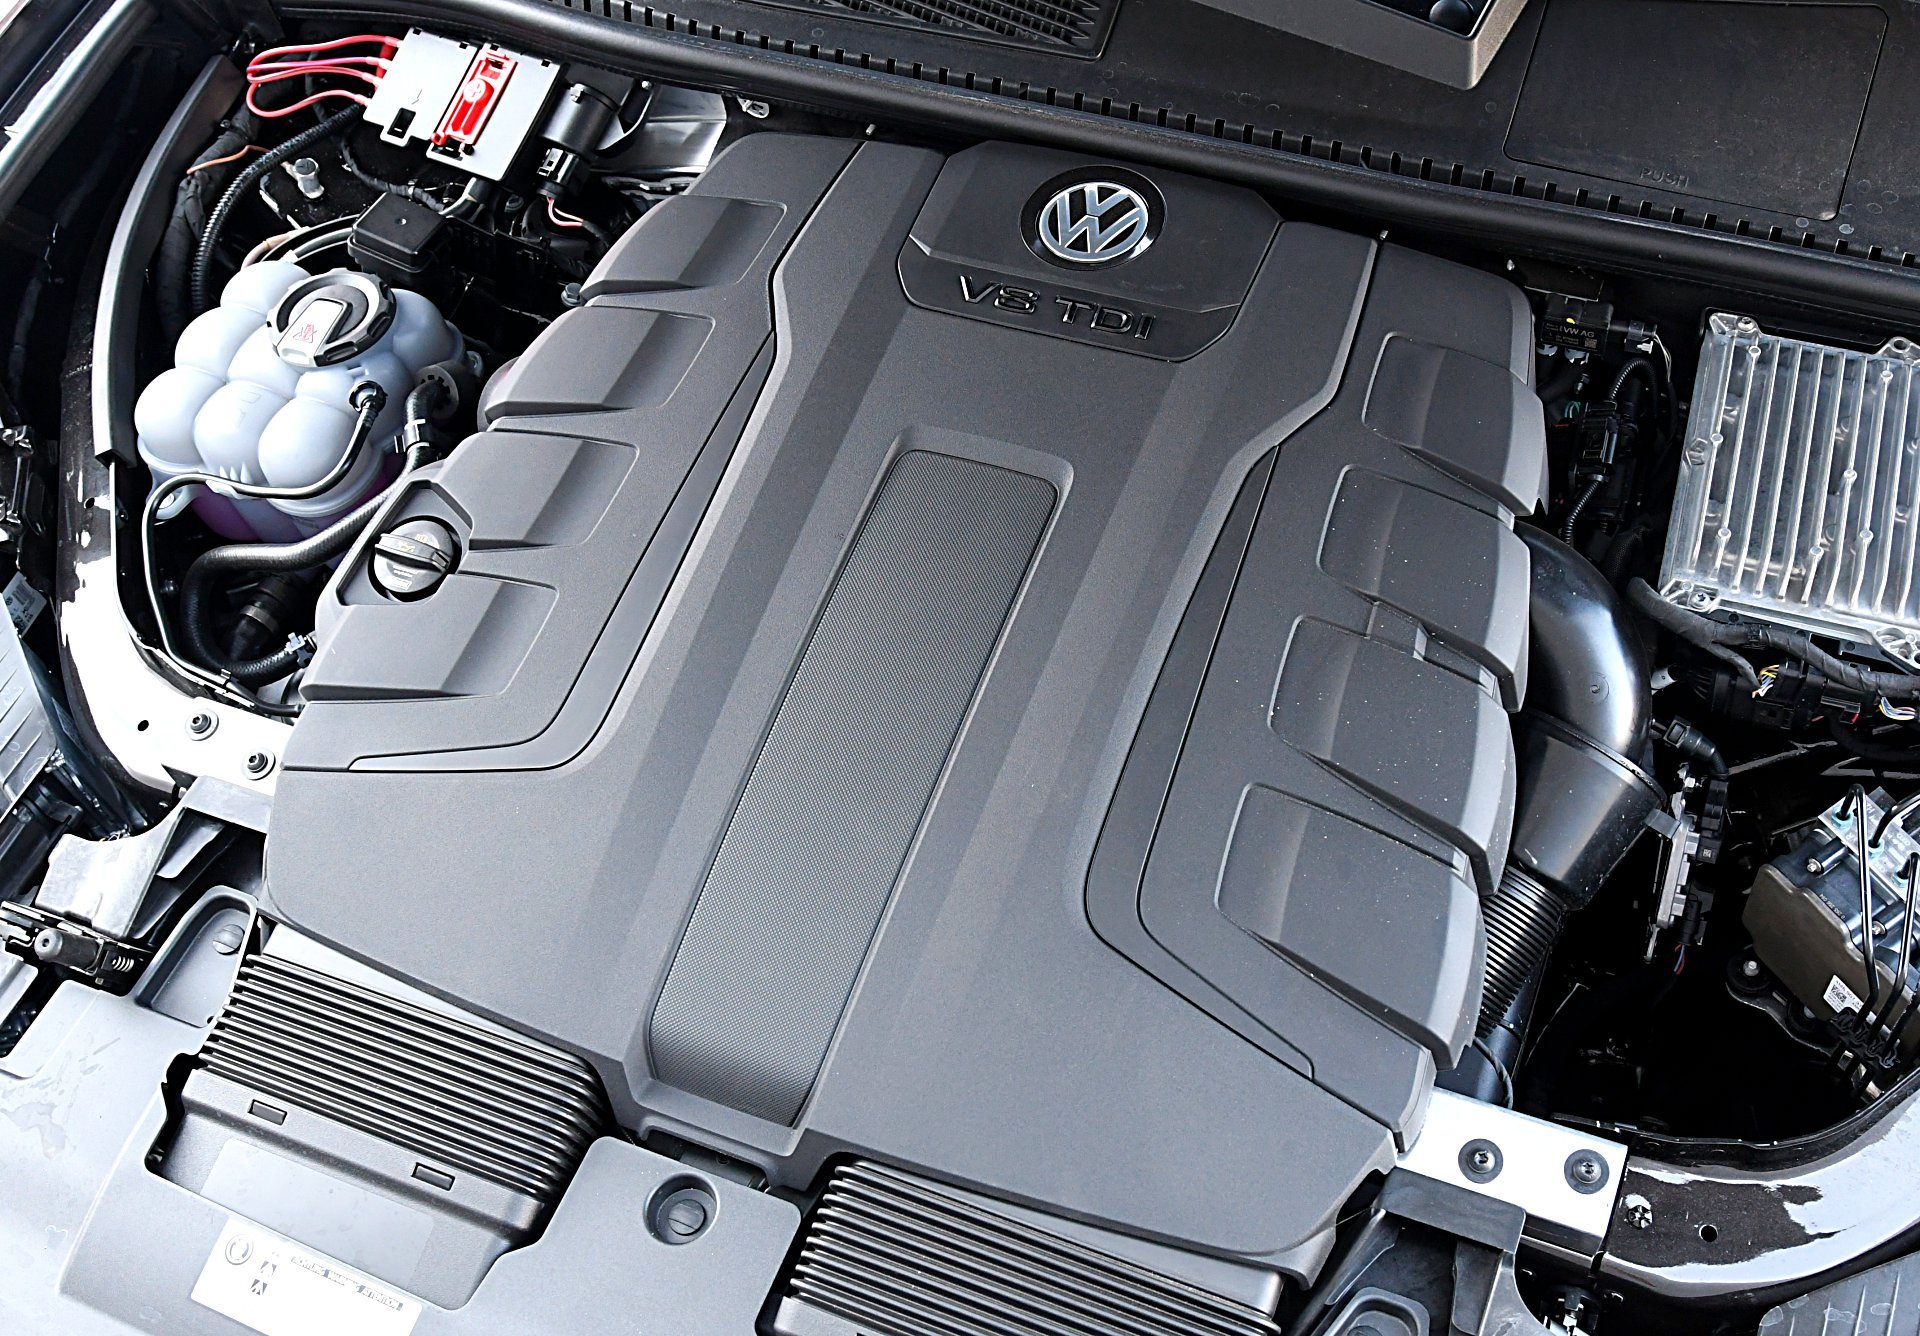 Volkswagen Touareg 4.0 V8 TDI silnik